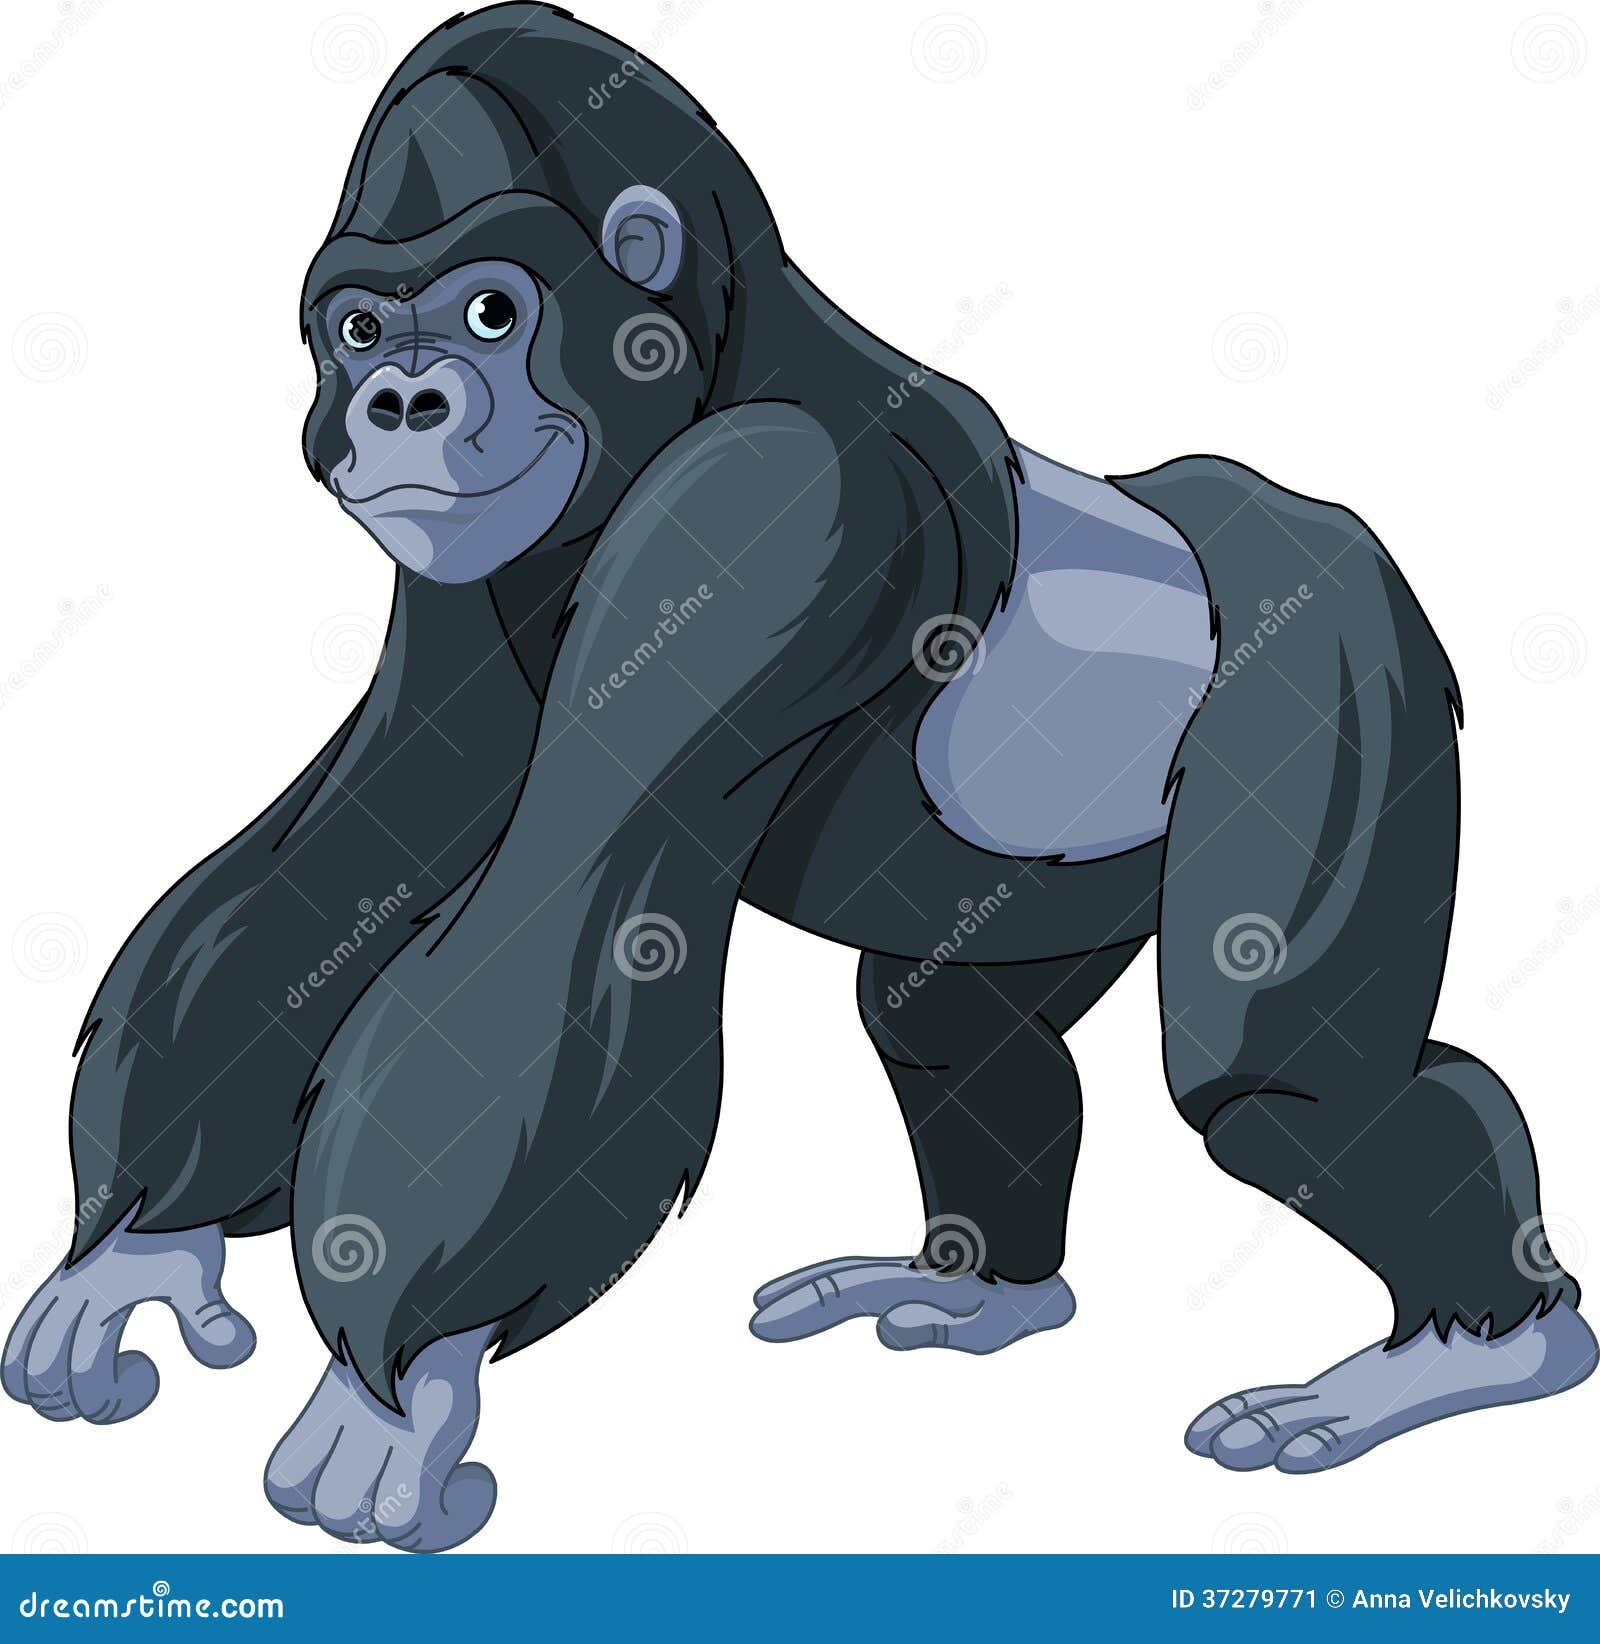 Gorilla Stock Image - Image: 37279771